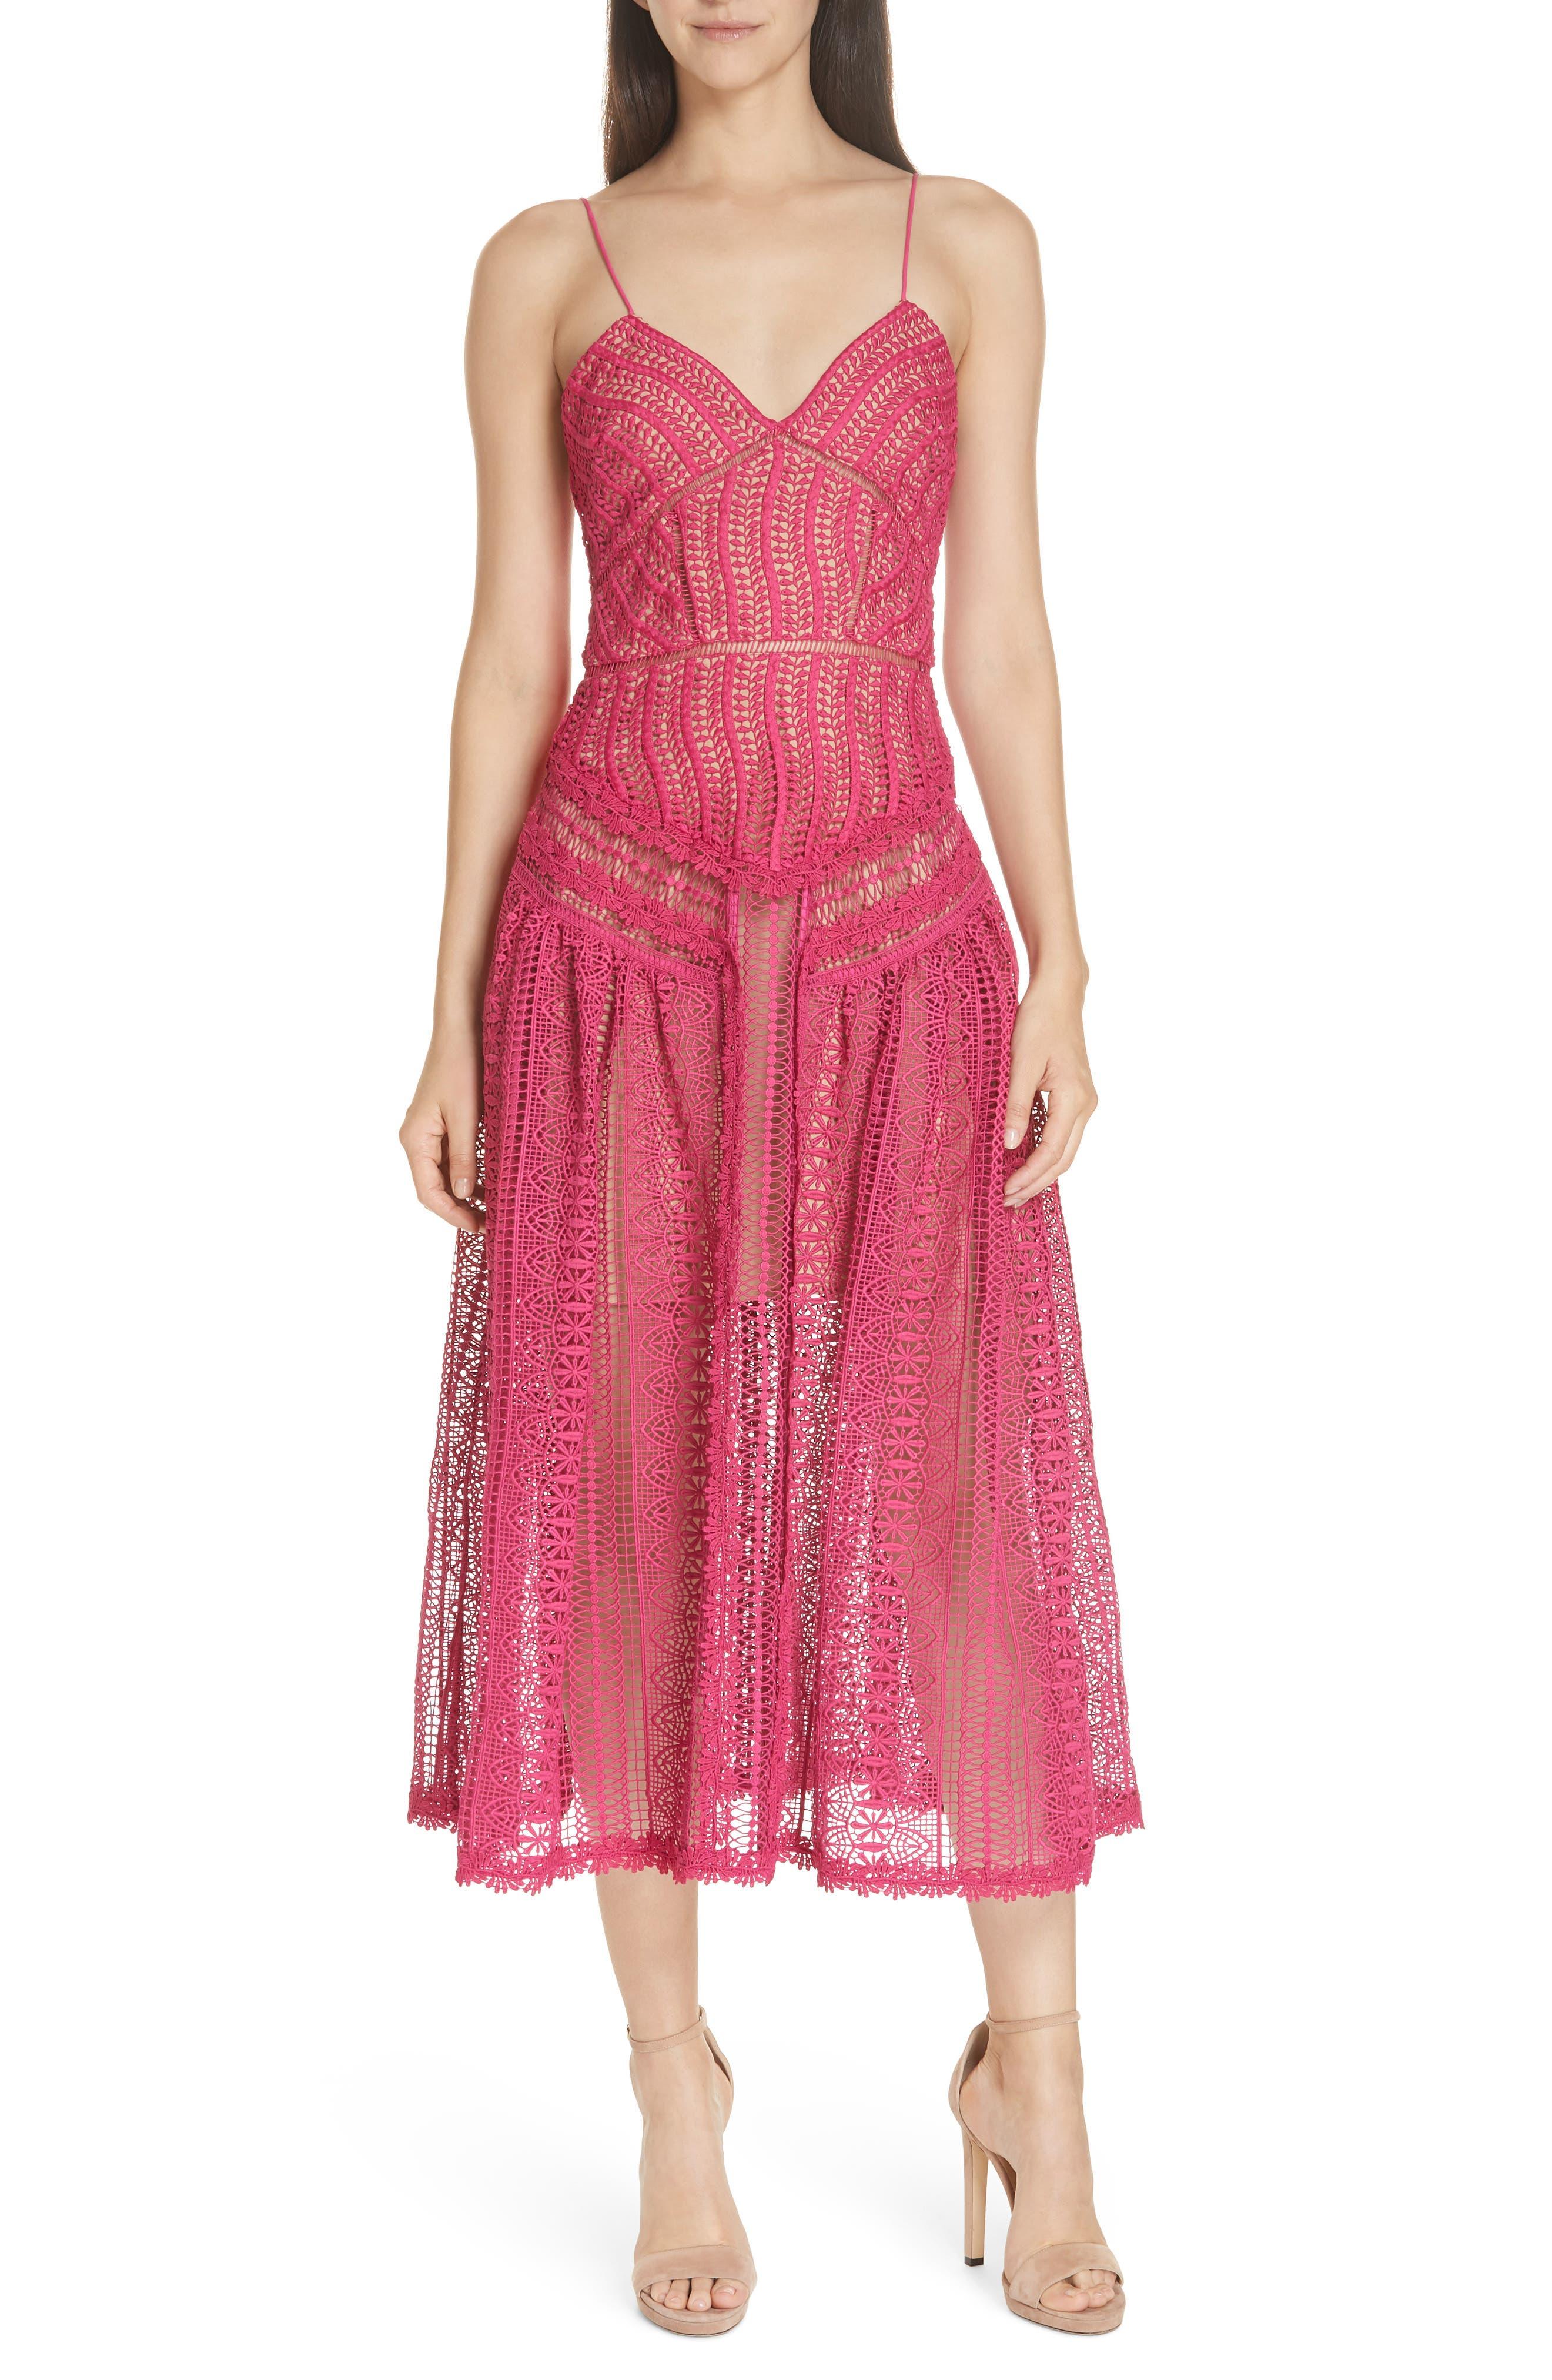 Self-Portrait Wave Lace Midi Dress, Pink